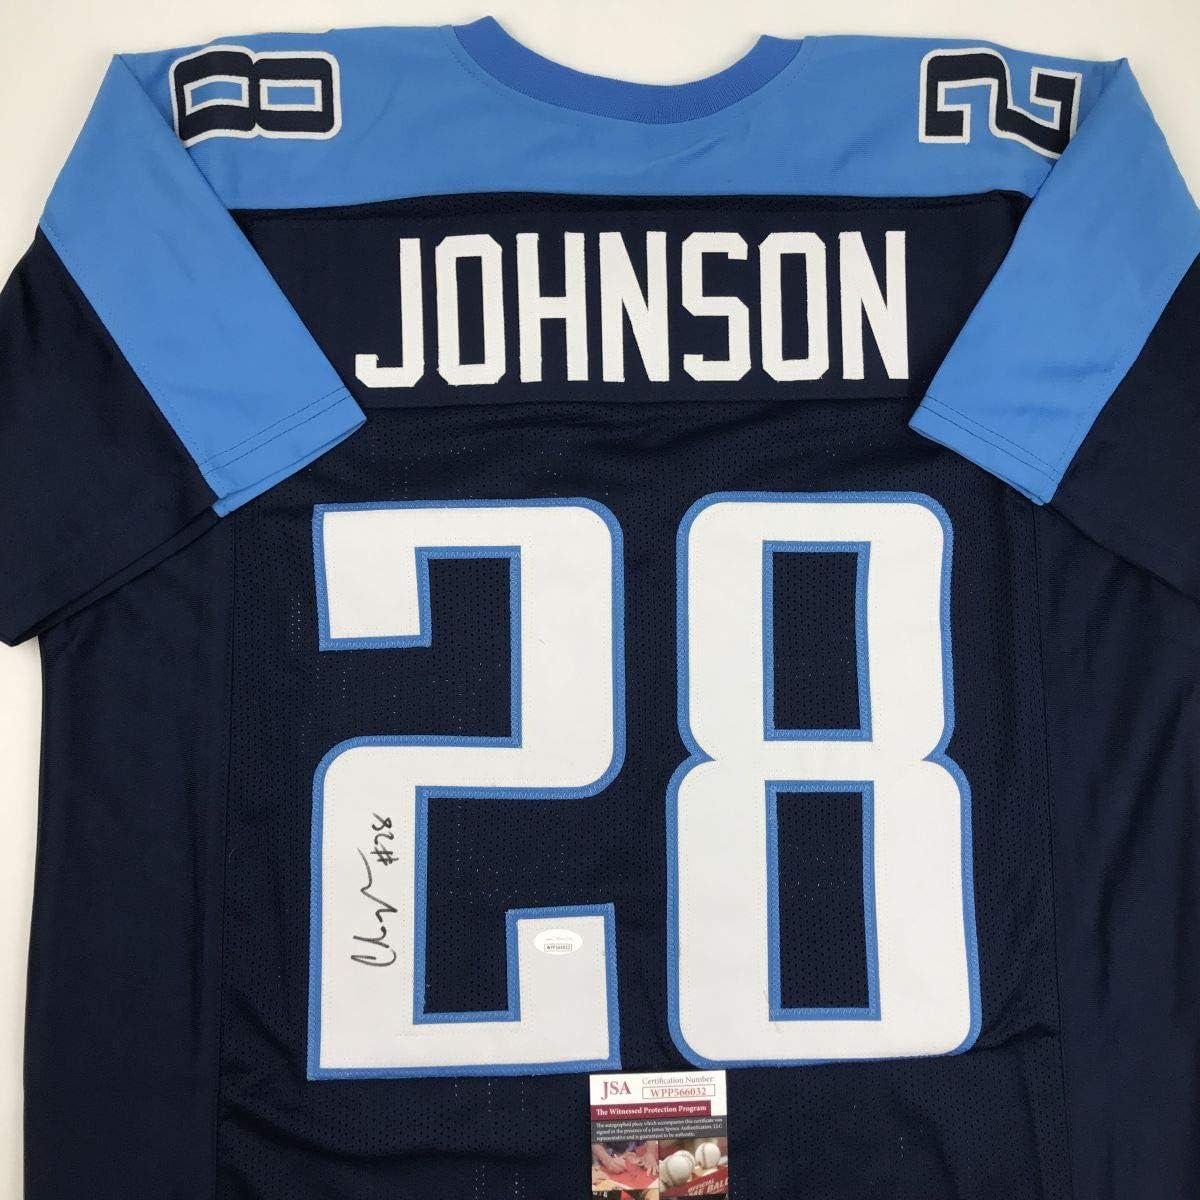 Autographed/Signed Chris Johnson Tennessee Dark Blue Football Jersey JSA COA